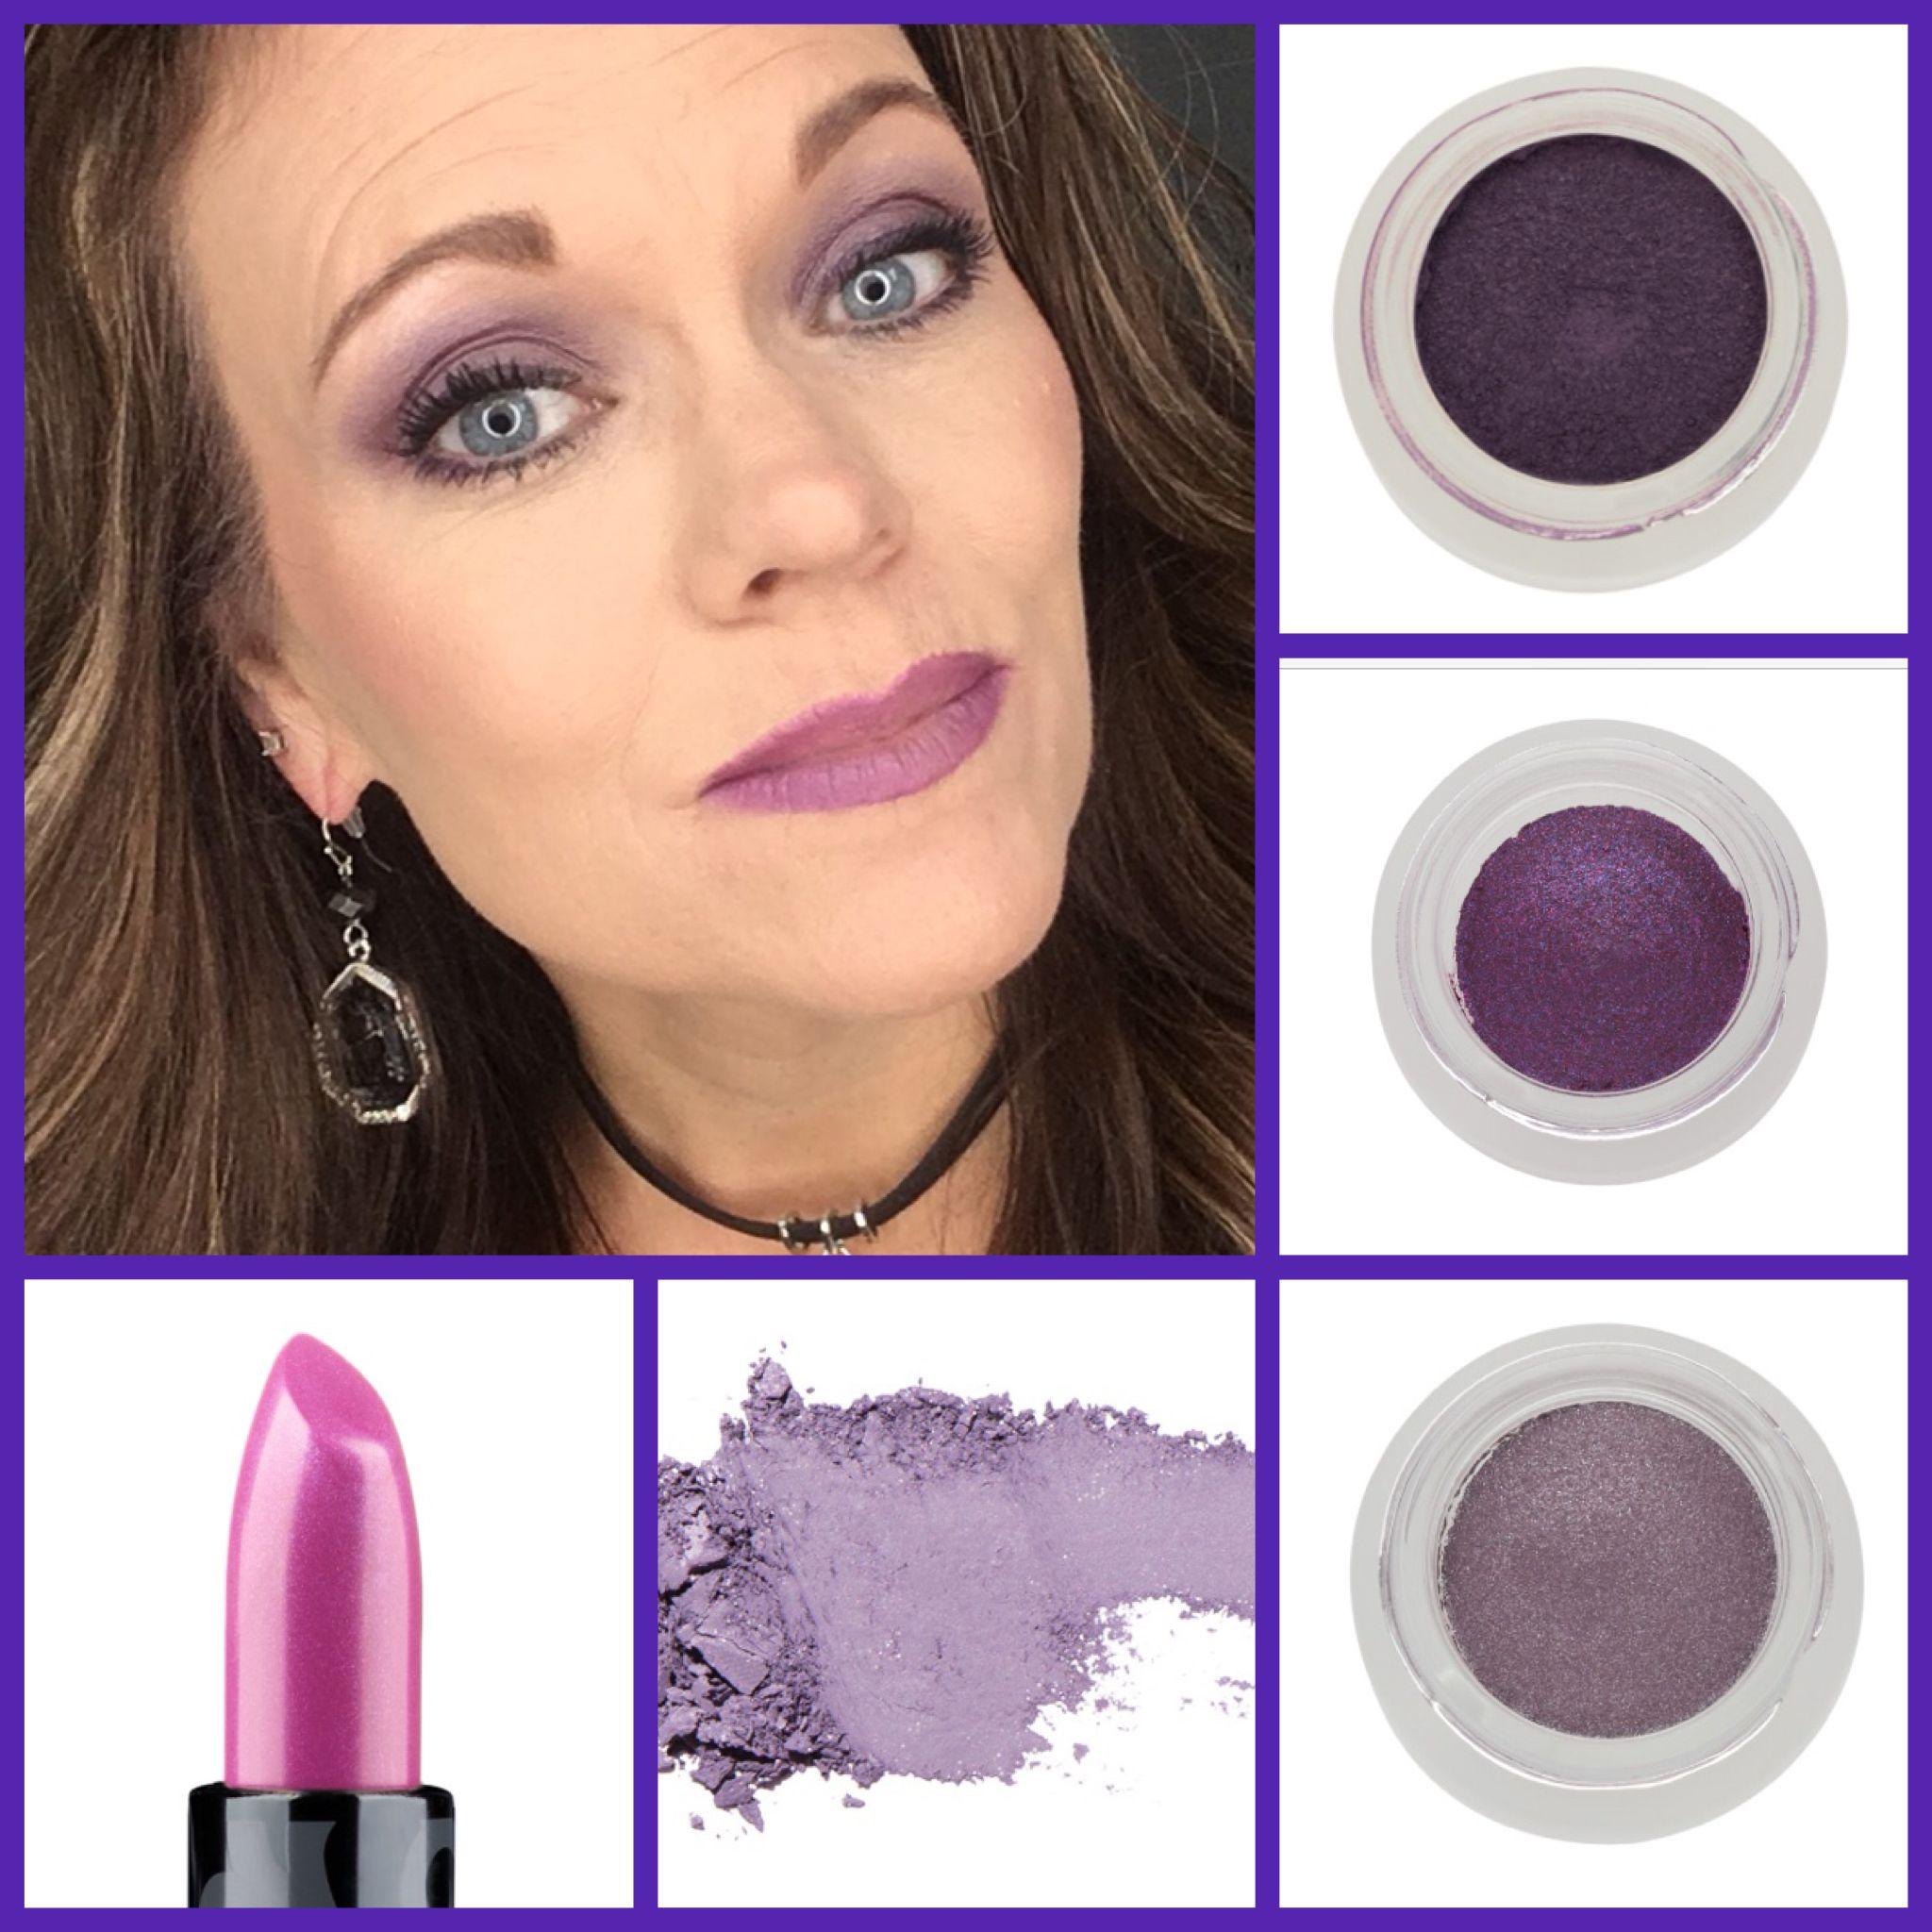 Purple Cascade Eye Look And Purple Lips Splurge Cream Shadow